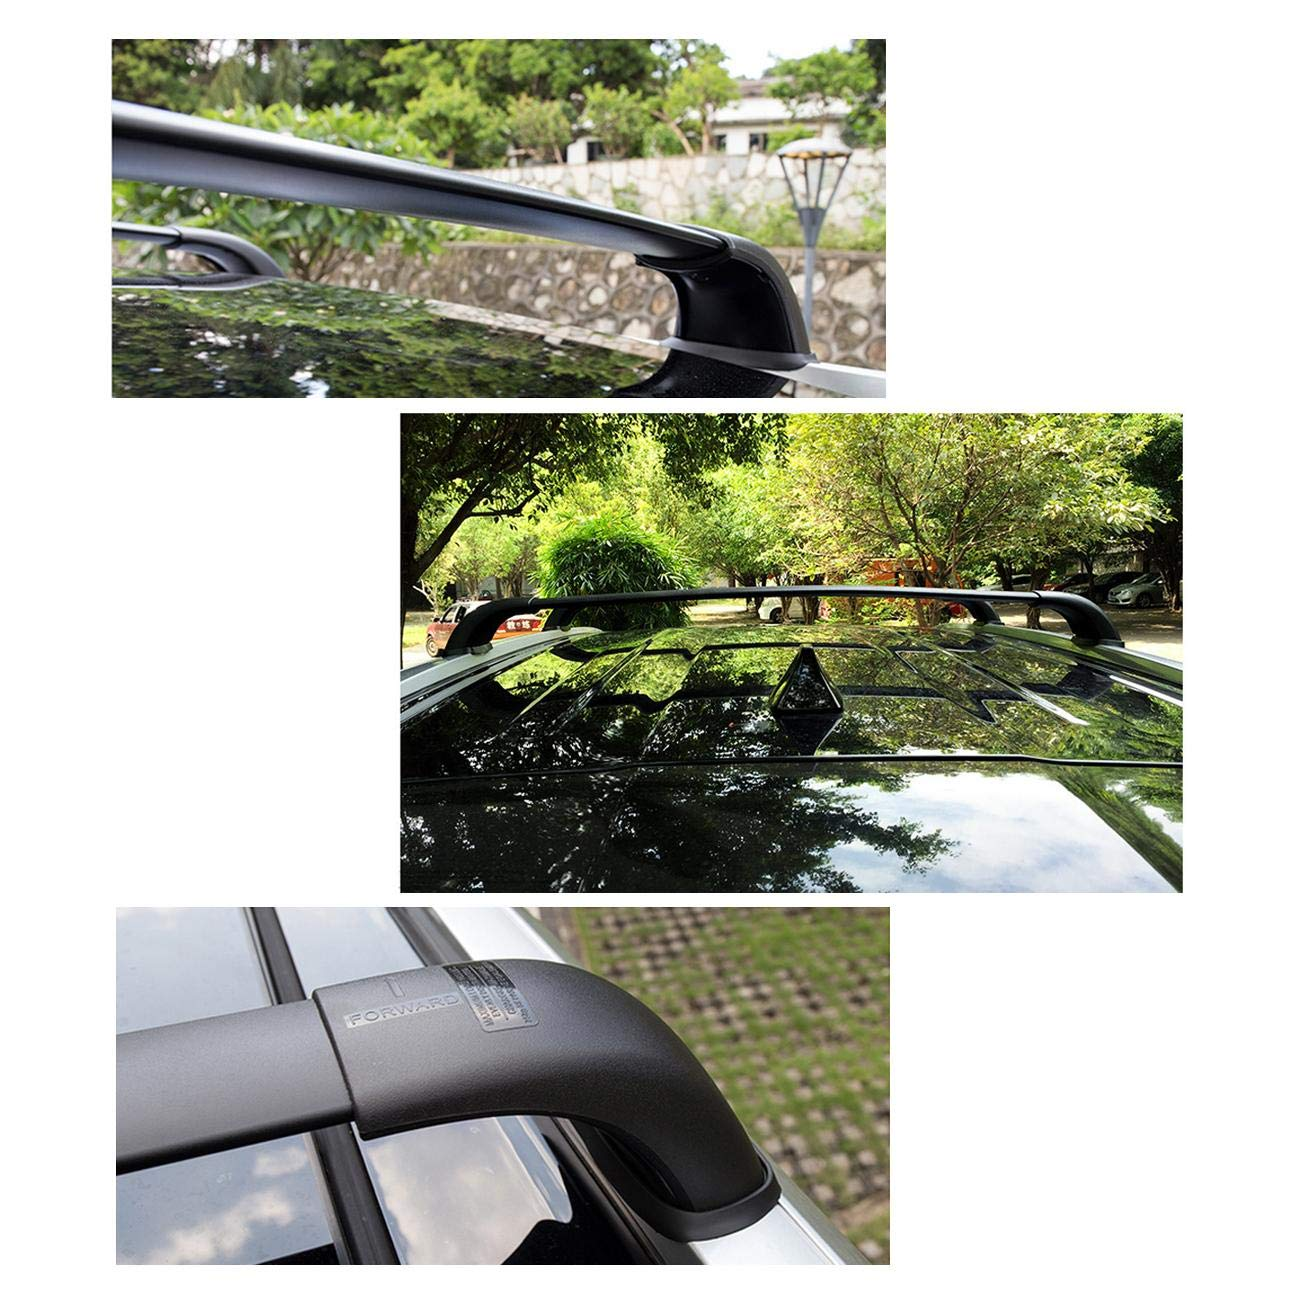 Pair, Black ALAVENTE Roof Rack Cross Bars for Toyota Highlander 2008 2009 2010 2011 2012 2013